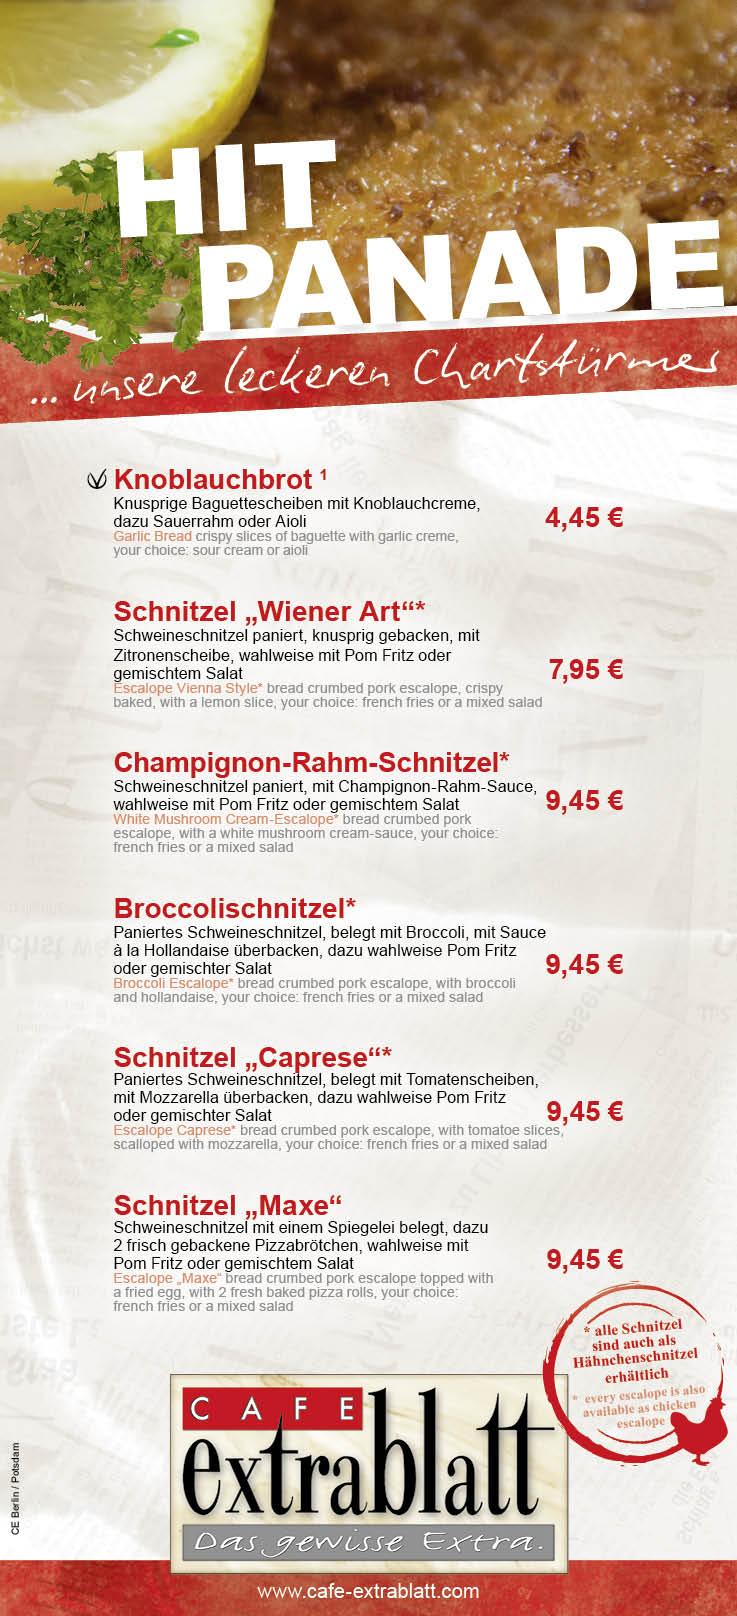 Cafe Extrablatt Berlin Speisekarte